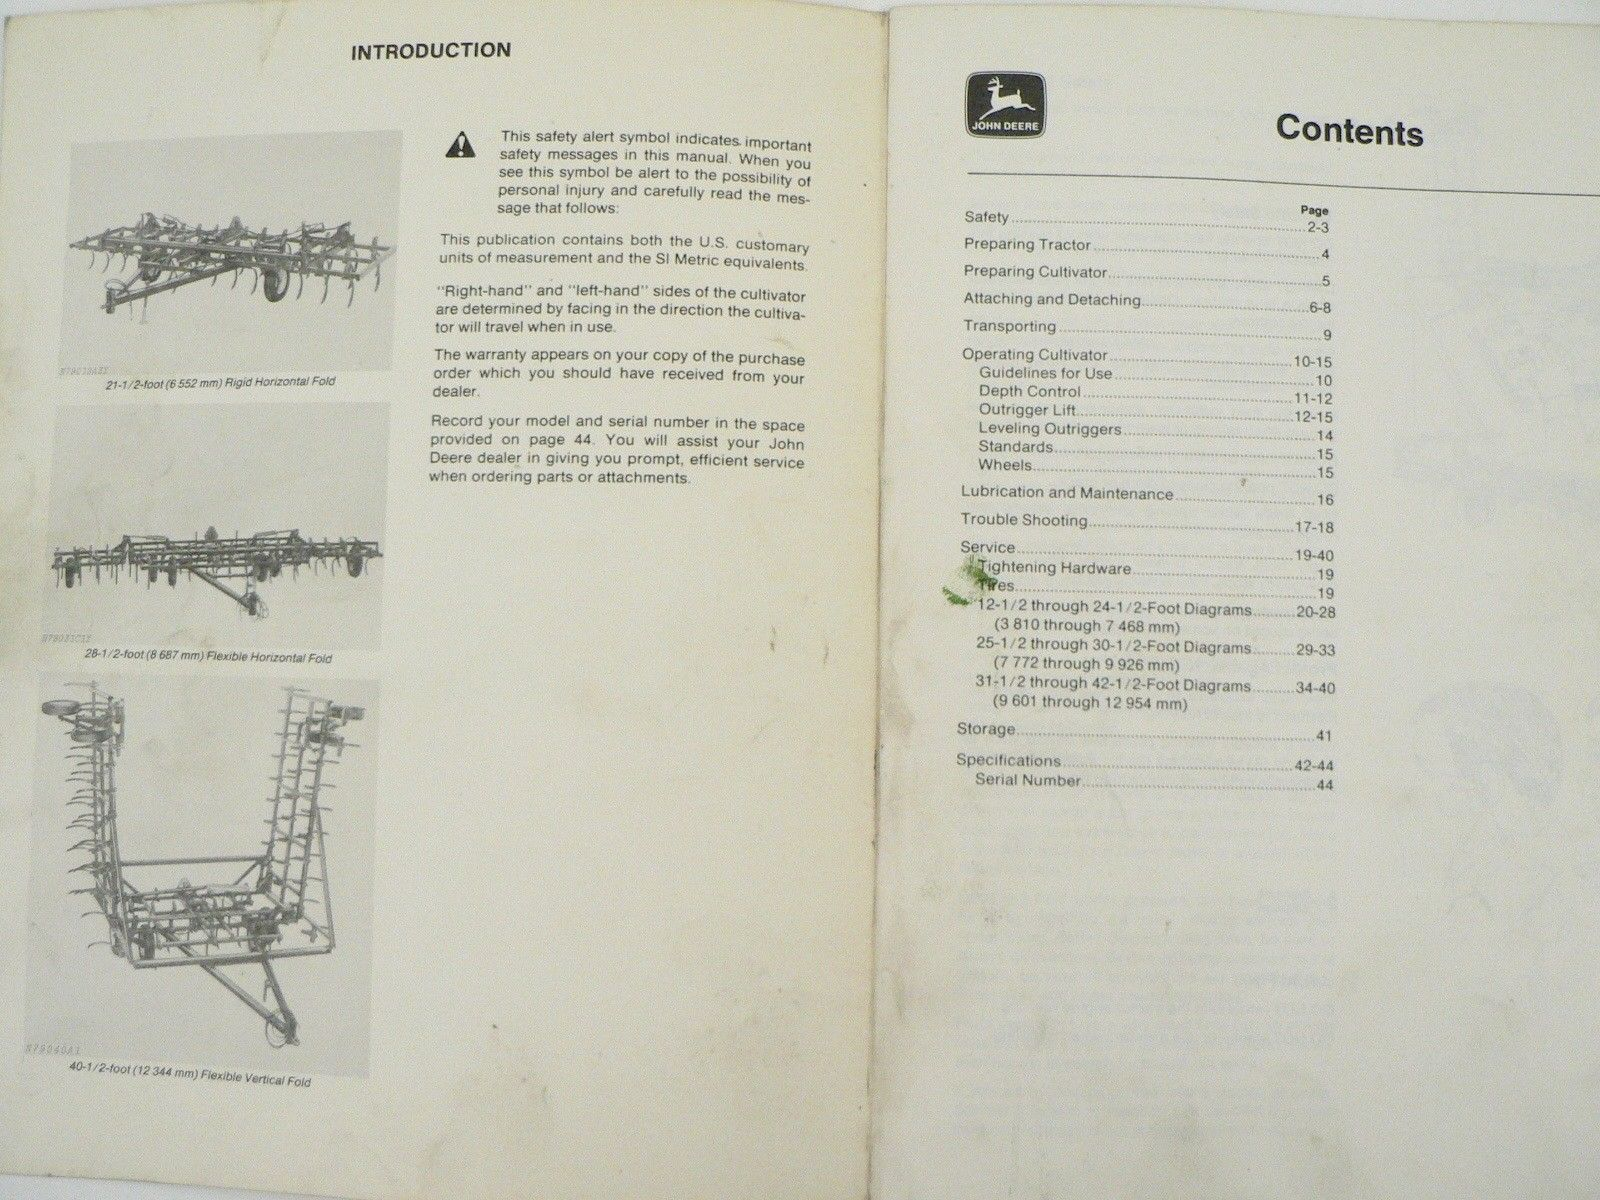 ... John Deere Owners Manual 1010 Series Drawn Field Cultivators Trouble  Shooting